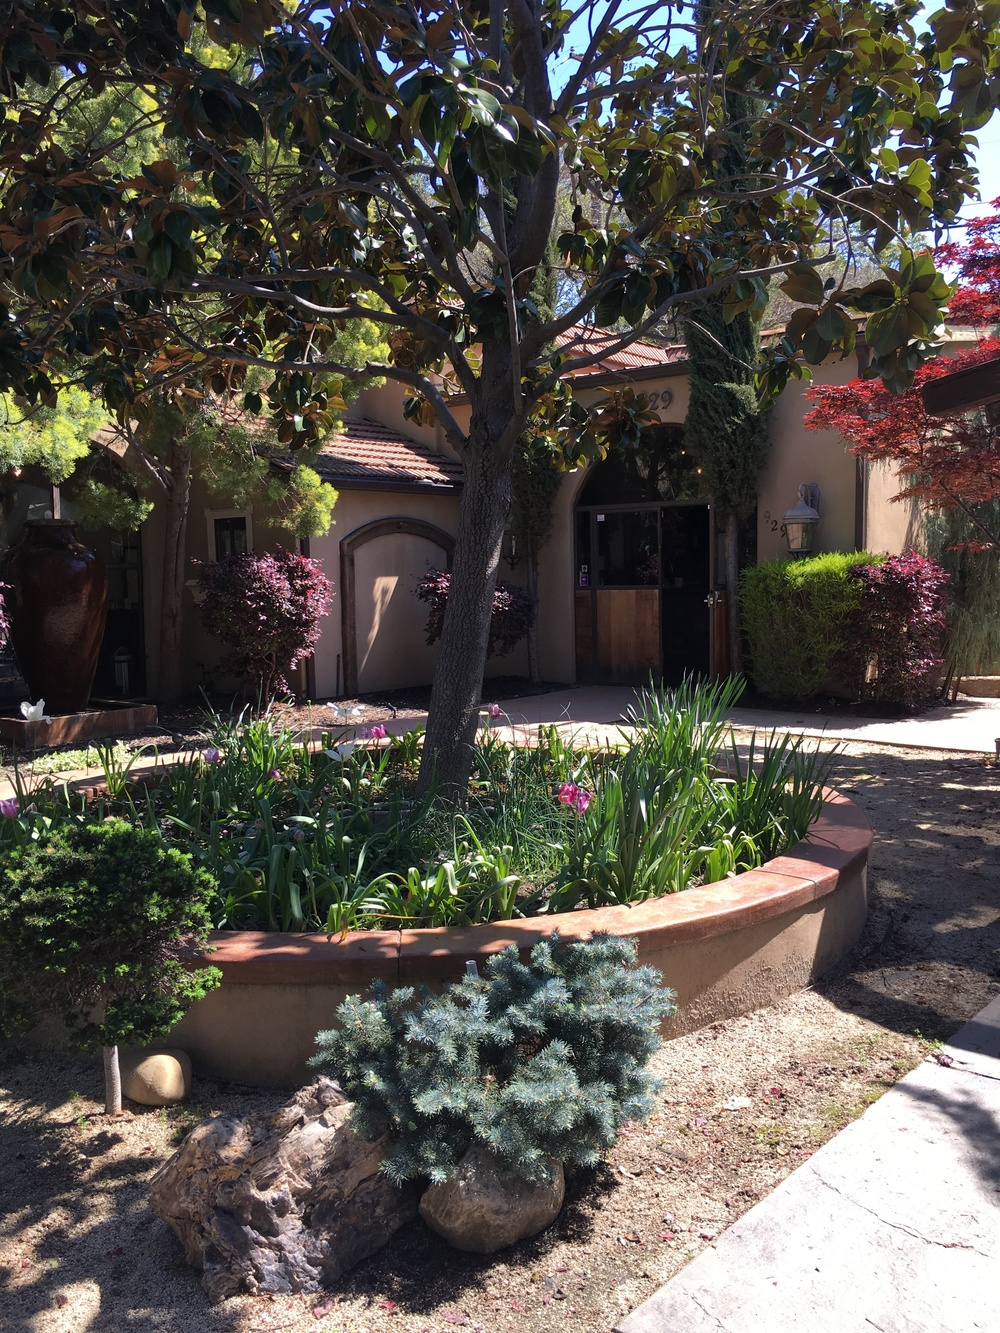 Garden-and-event-space-sutter-street-folsom-sacramento-area-california.JPG